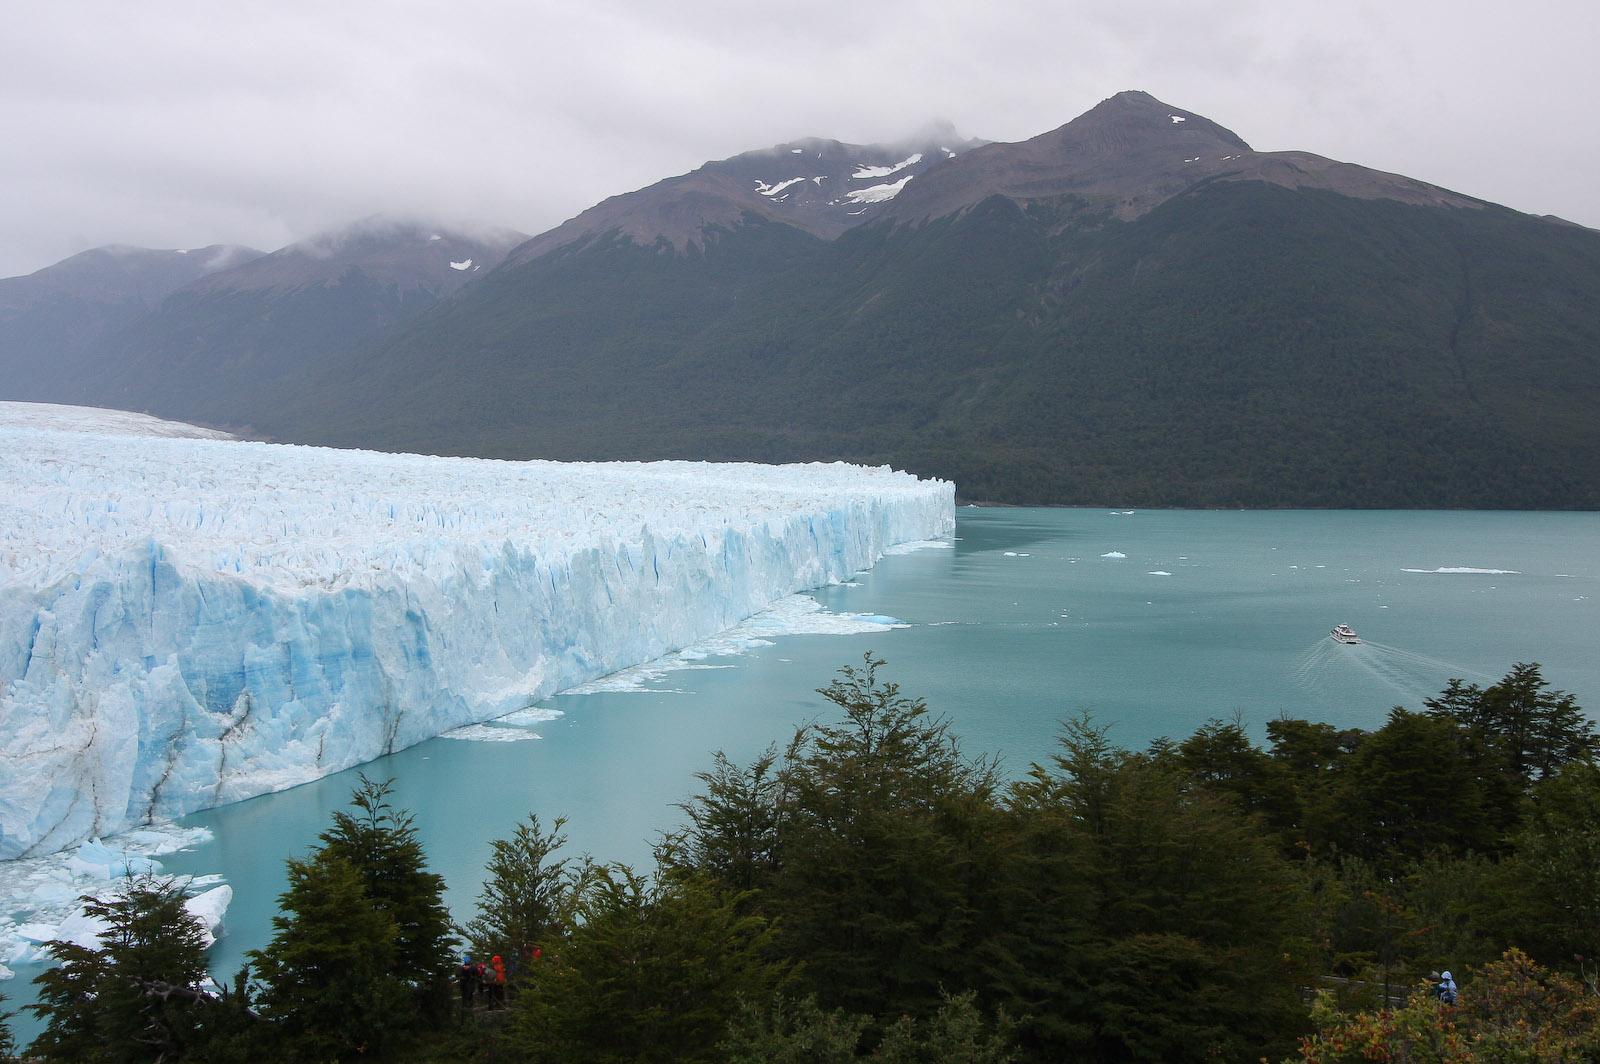 El Calafate Argentina  City new picture : Perito Moreno Glacier El Calafate, Argentina